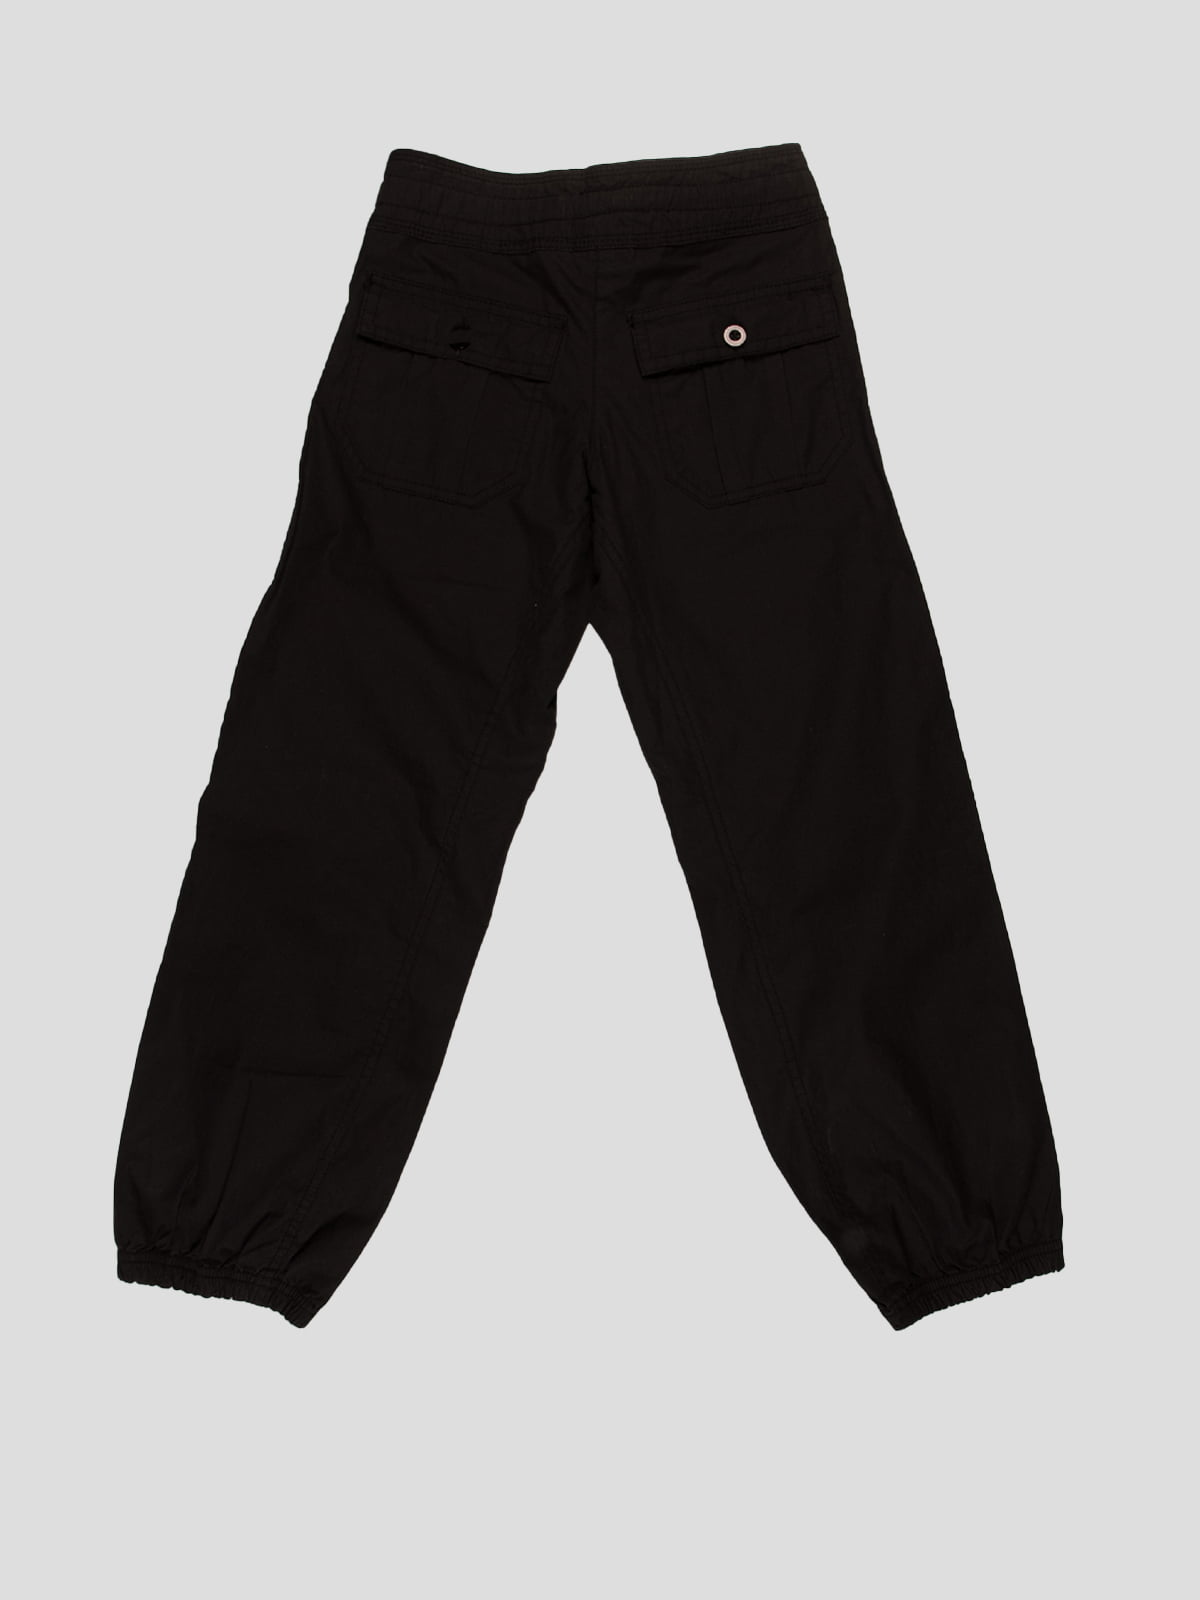 Штани чорні | 77565 | фото 2